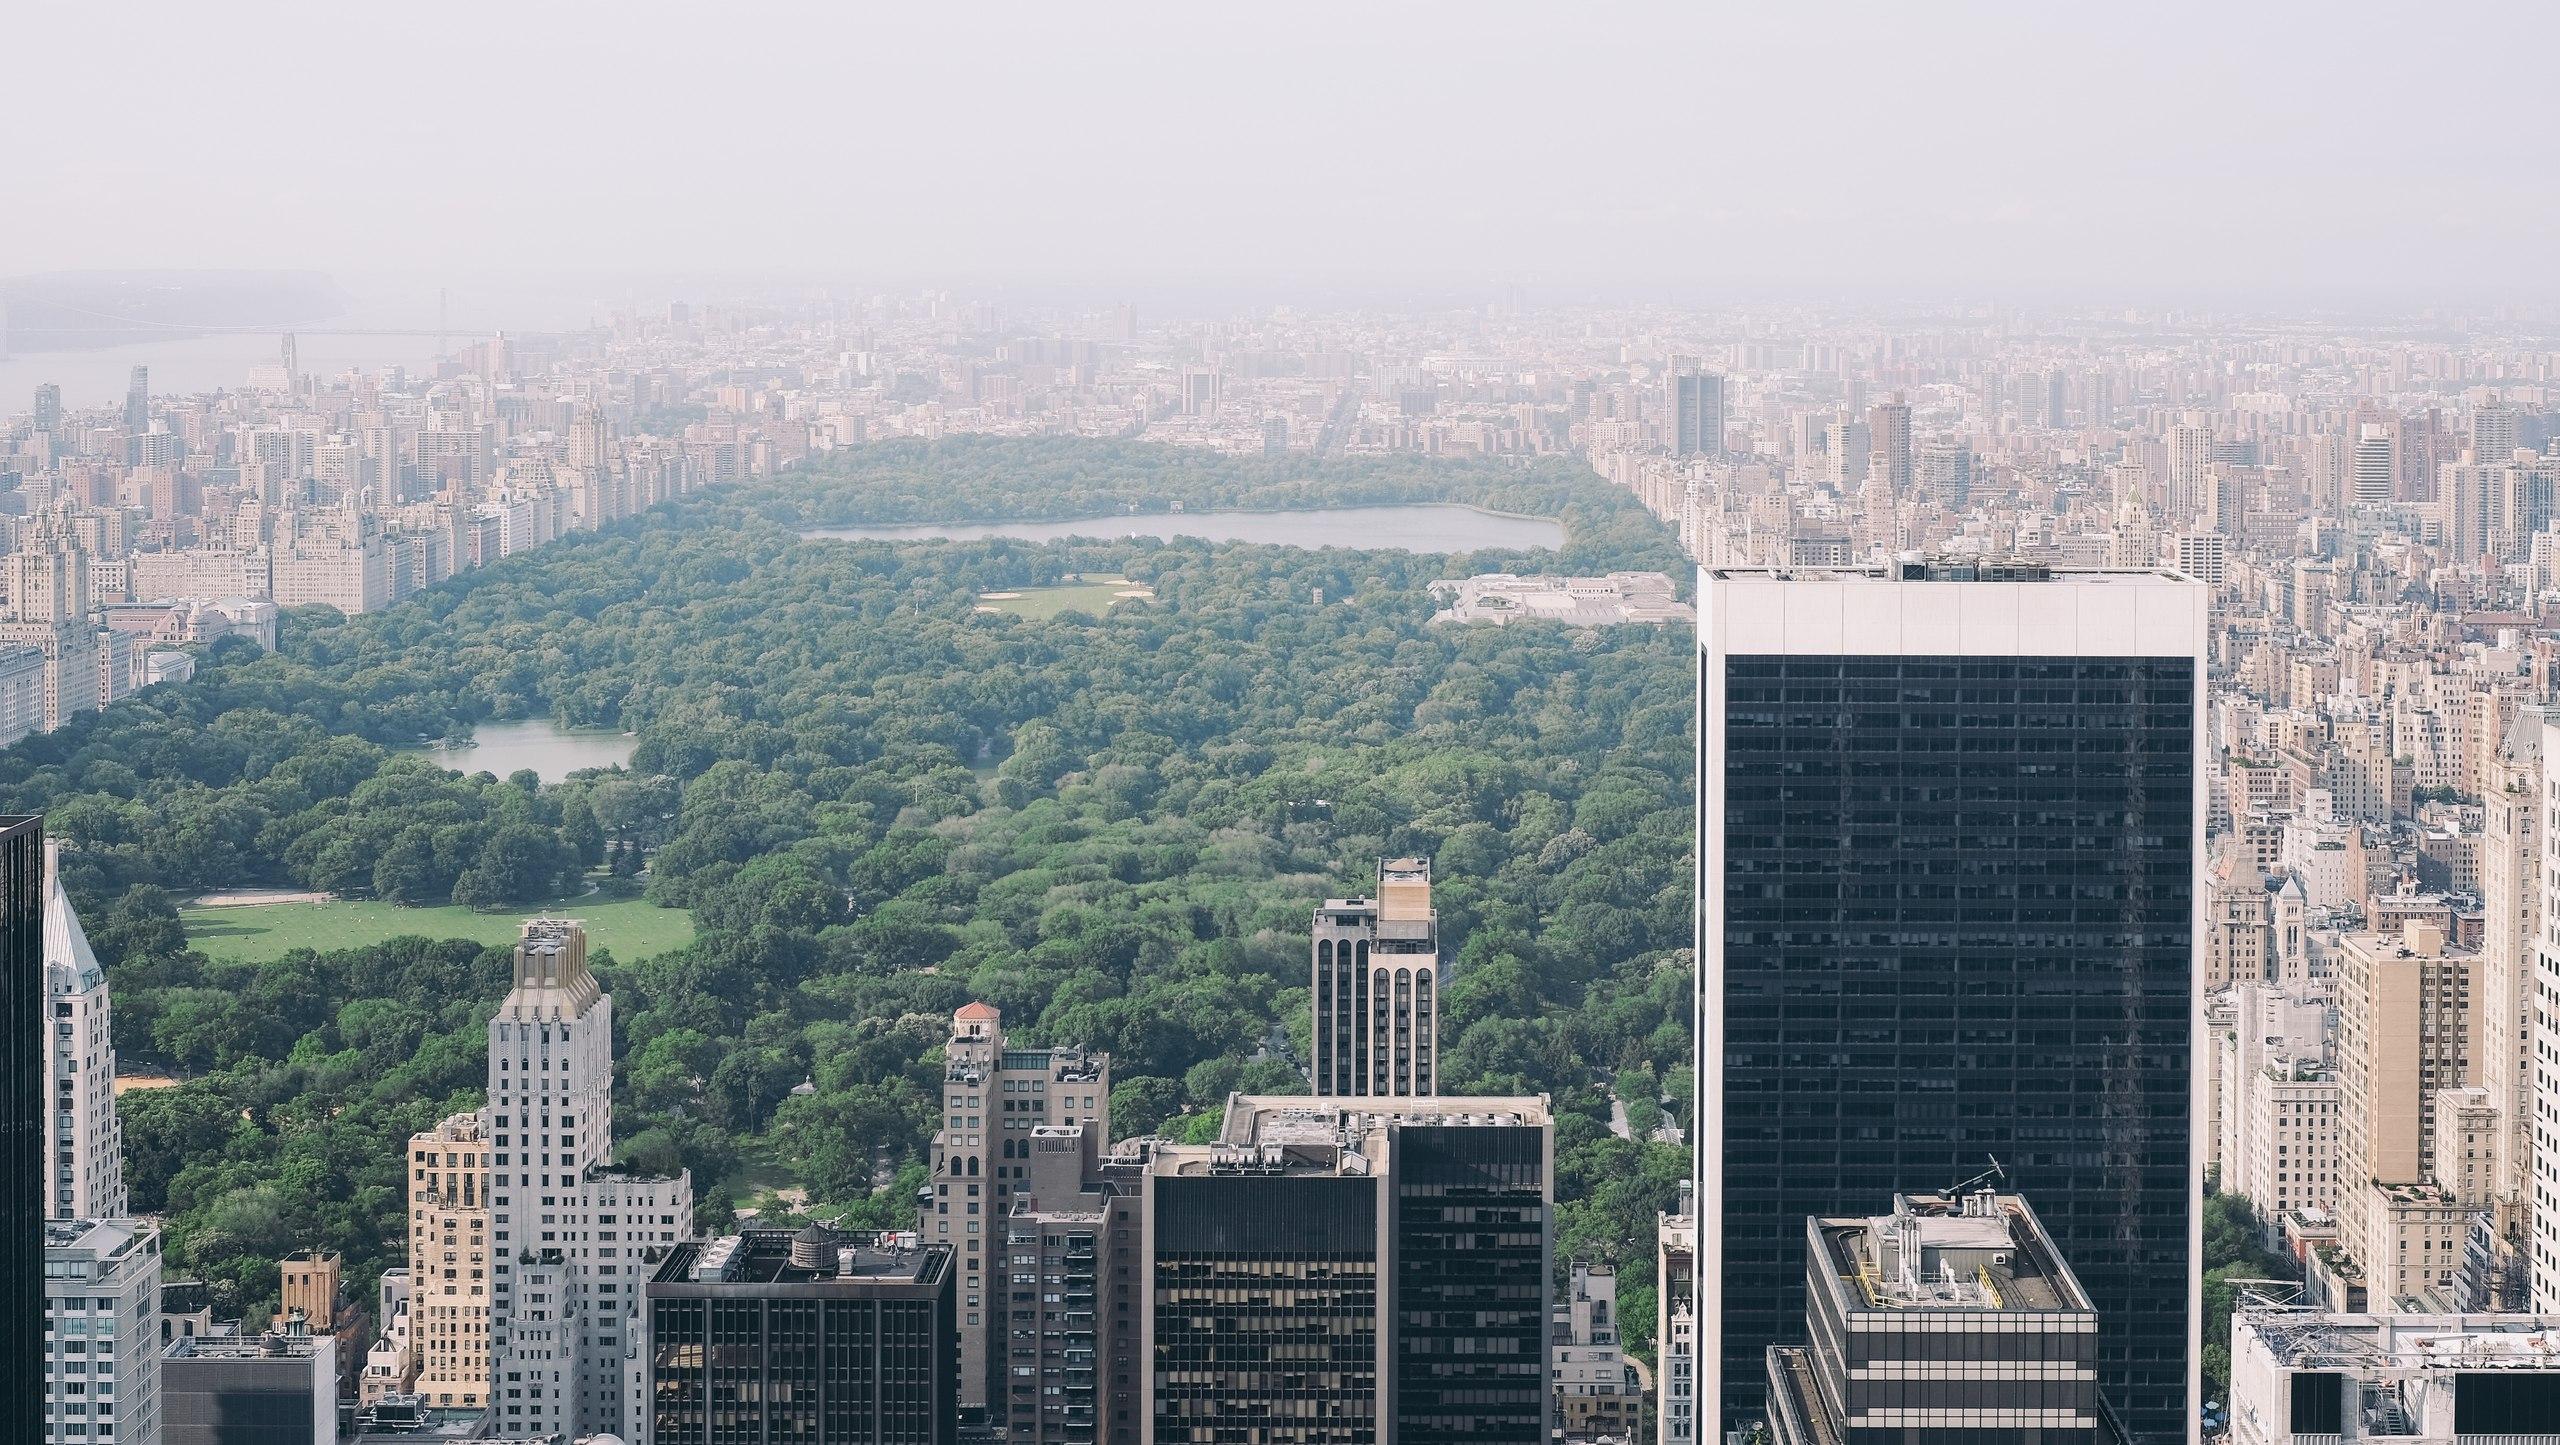 Нью-йорк центральный парк